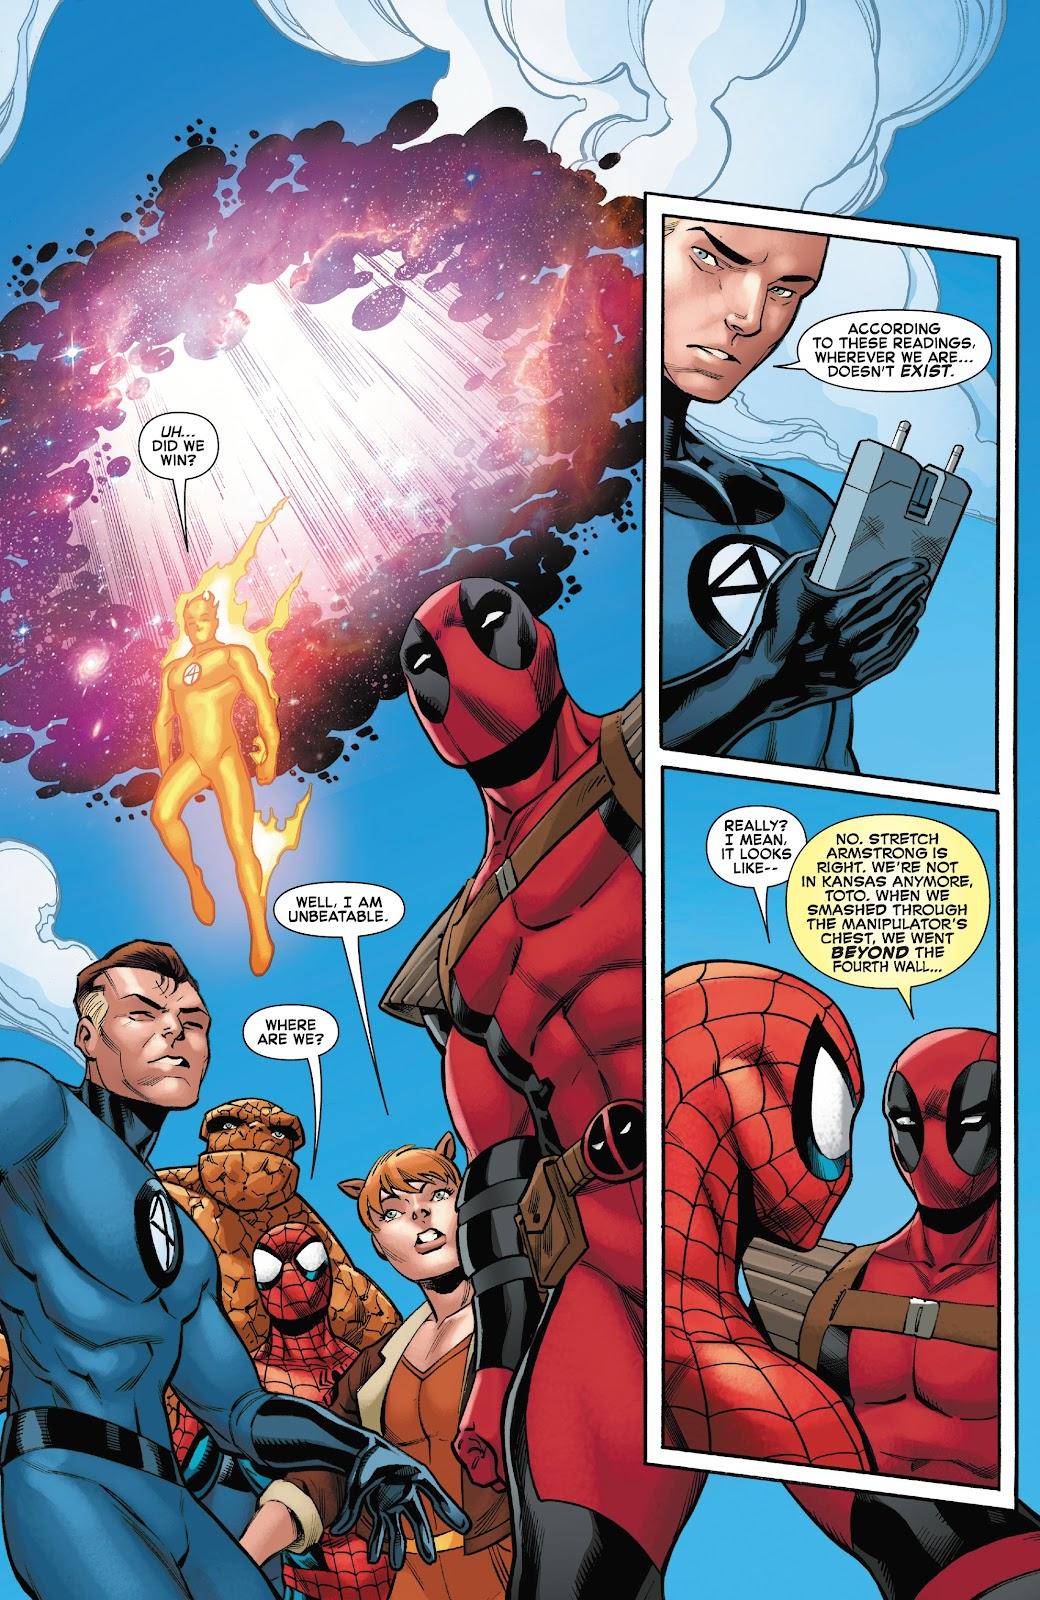 Read online Spider-Man/Deadpool comic -  Issue #49 - 21